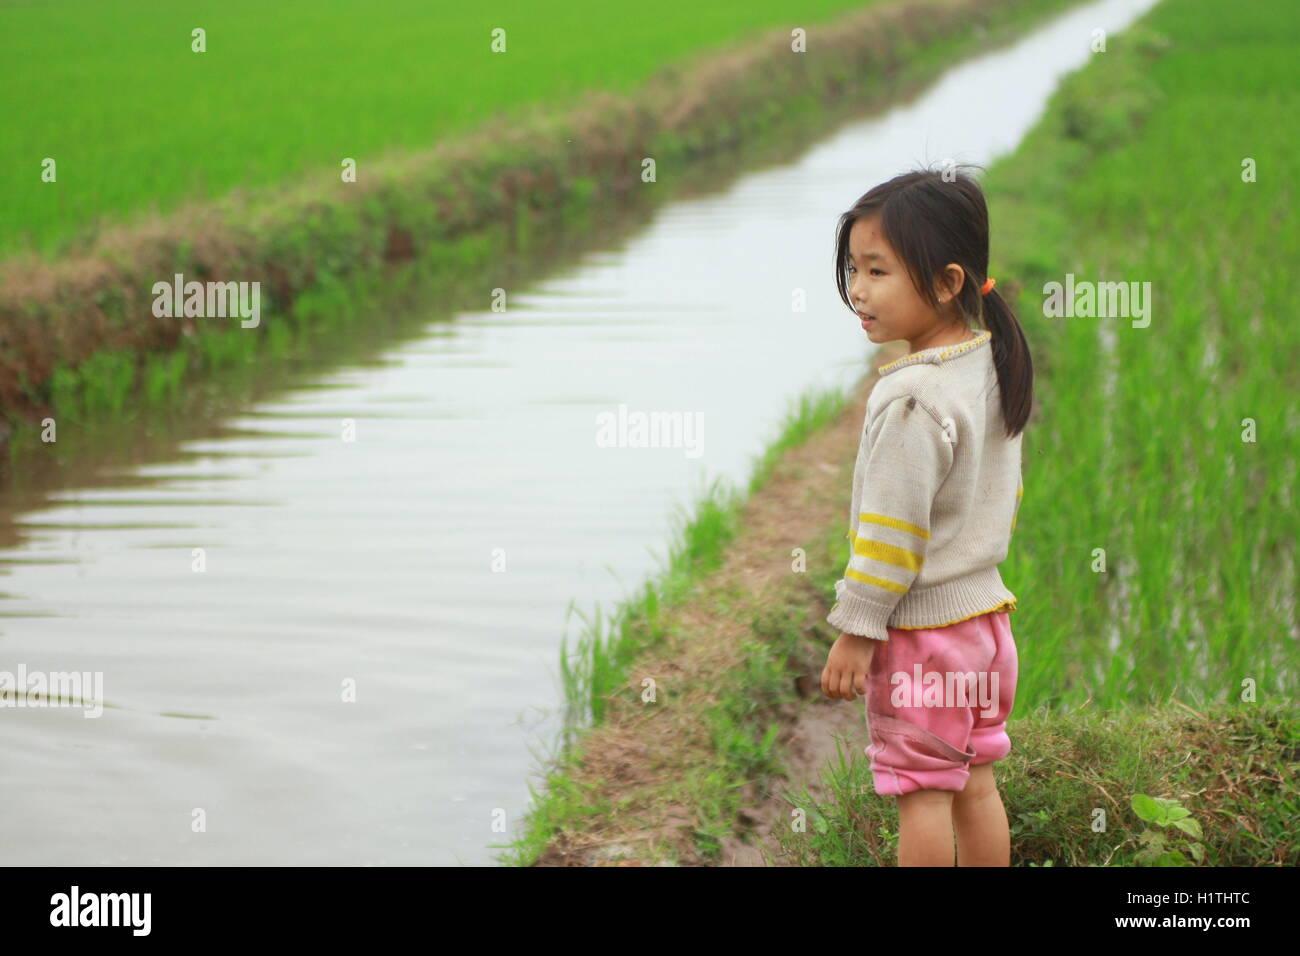 Chợ Viềng: Kids Playing In River Village Stock Photos & Kids Playing